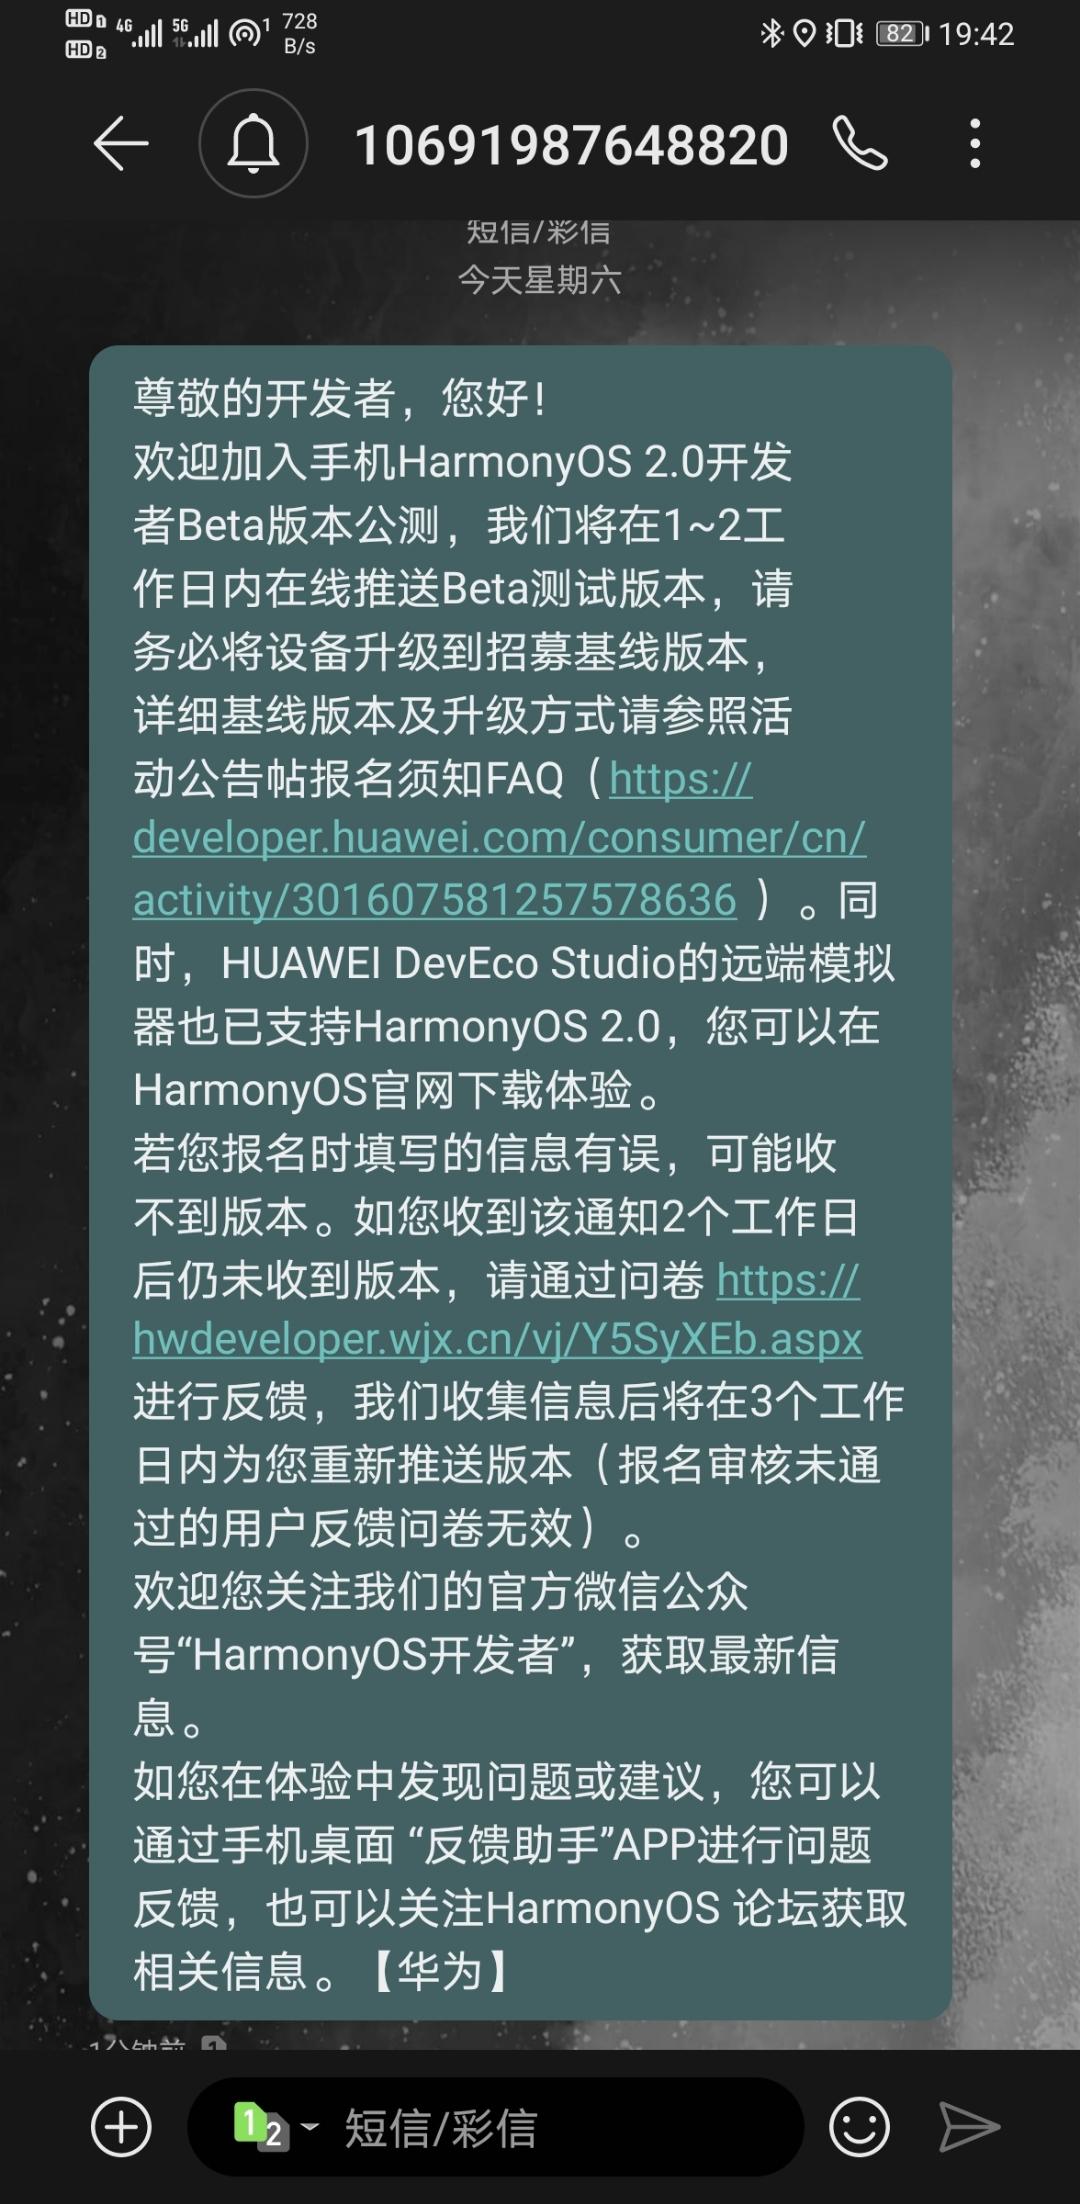 Screenshot_20210508_194222_com.android.mms.jpg